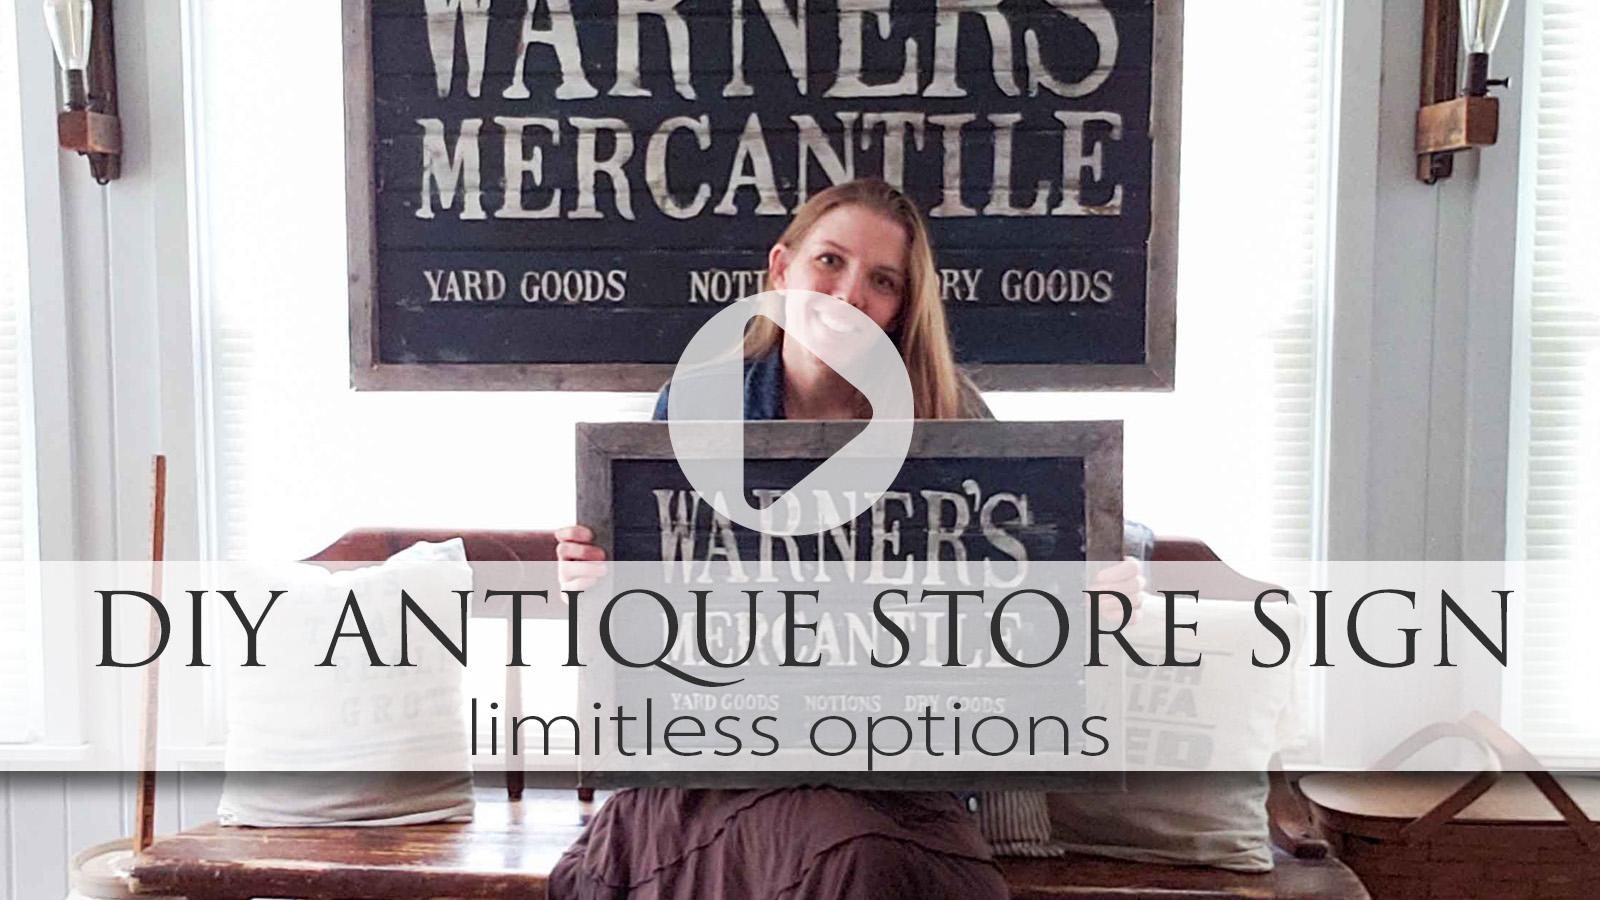 Video Tutorial DIY Antique Store Sign by Larissa of Prodigal Pieces | prodigalpieces.com #prodigalpieces